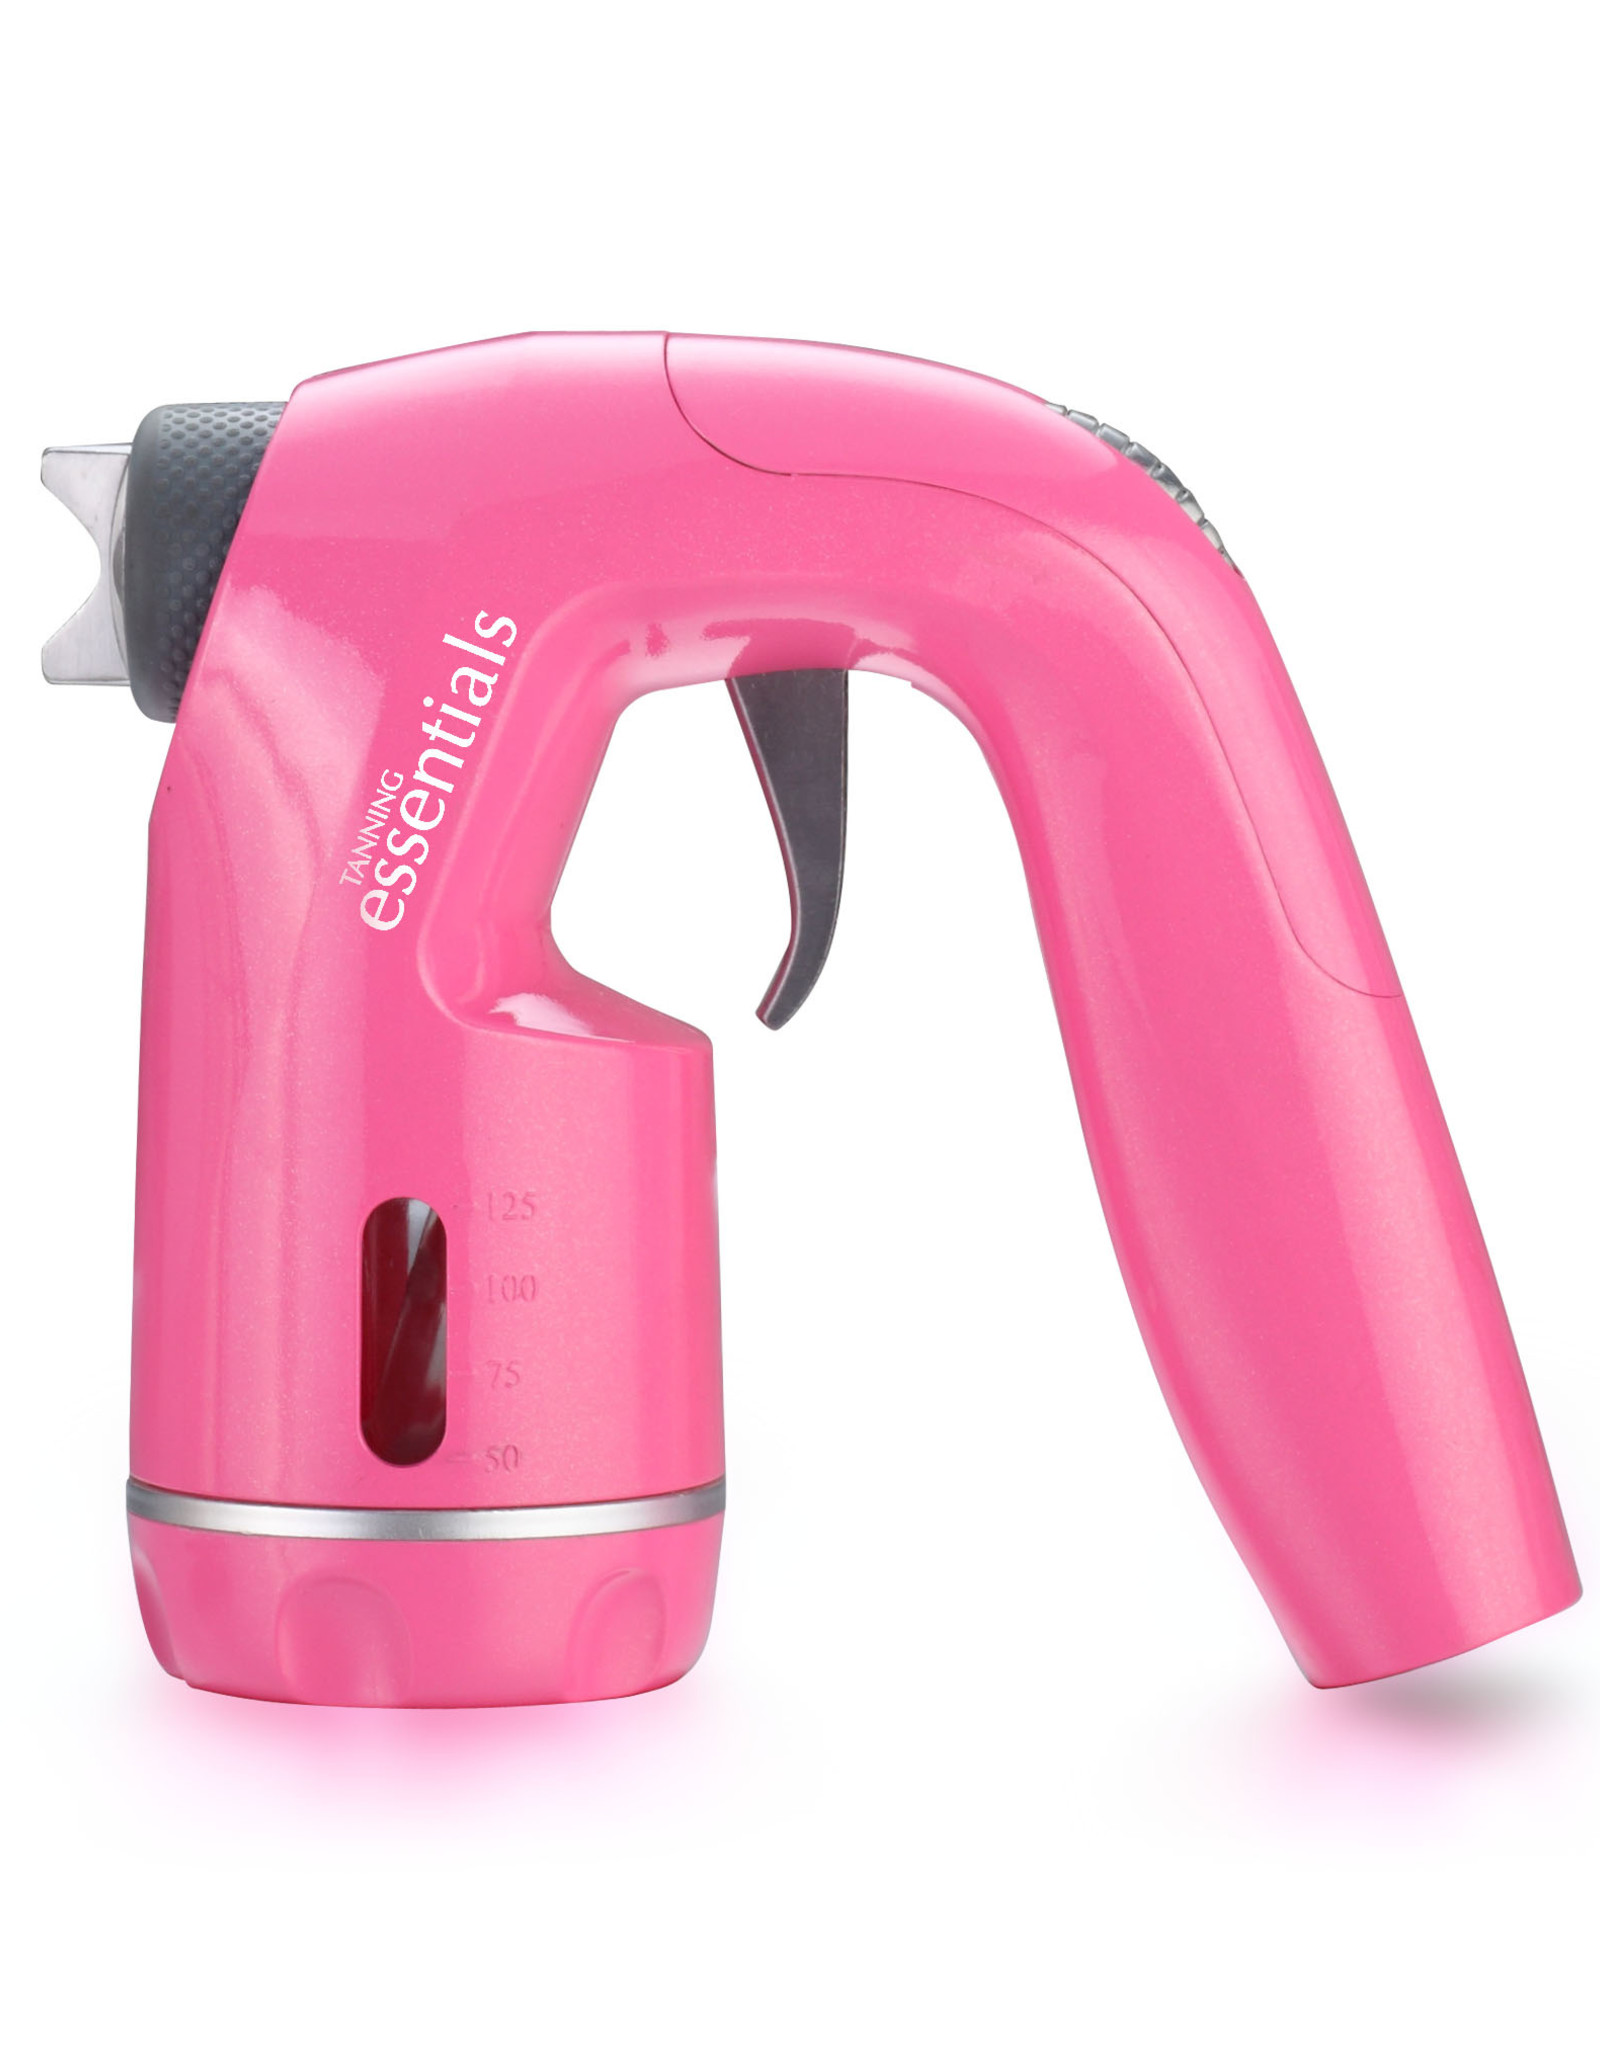 Tanning Essentials Tanning Essentials Pro V gun  applicator   - pink